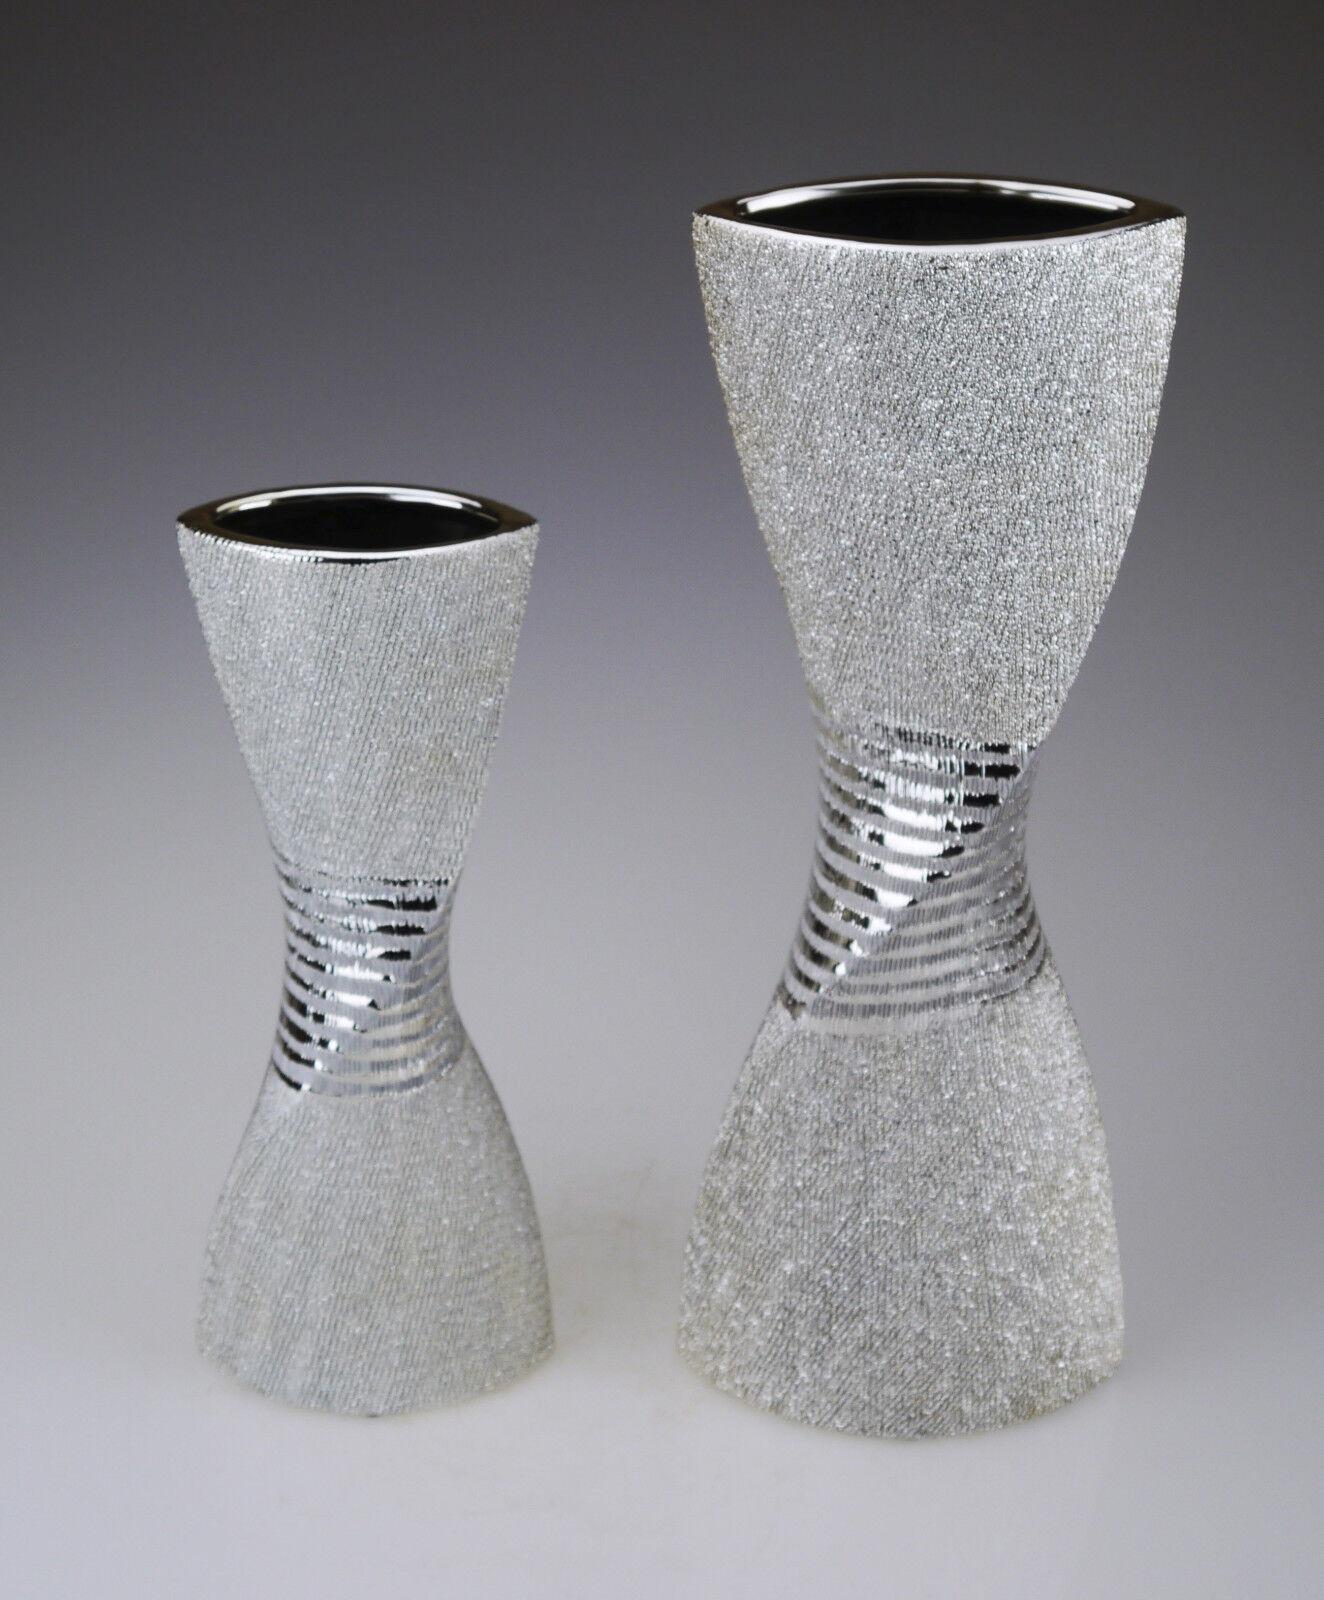 Blaumenvase silber Deko modern Vase Dekoration Tischdeko Tischvase Blaumen Design